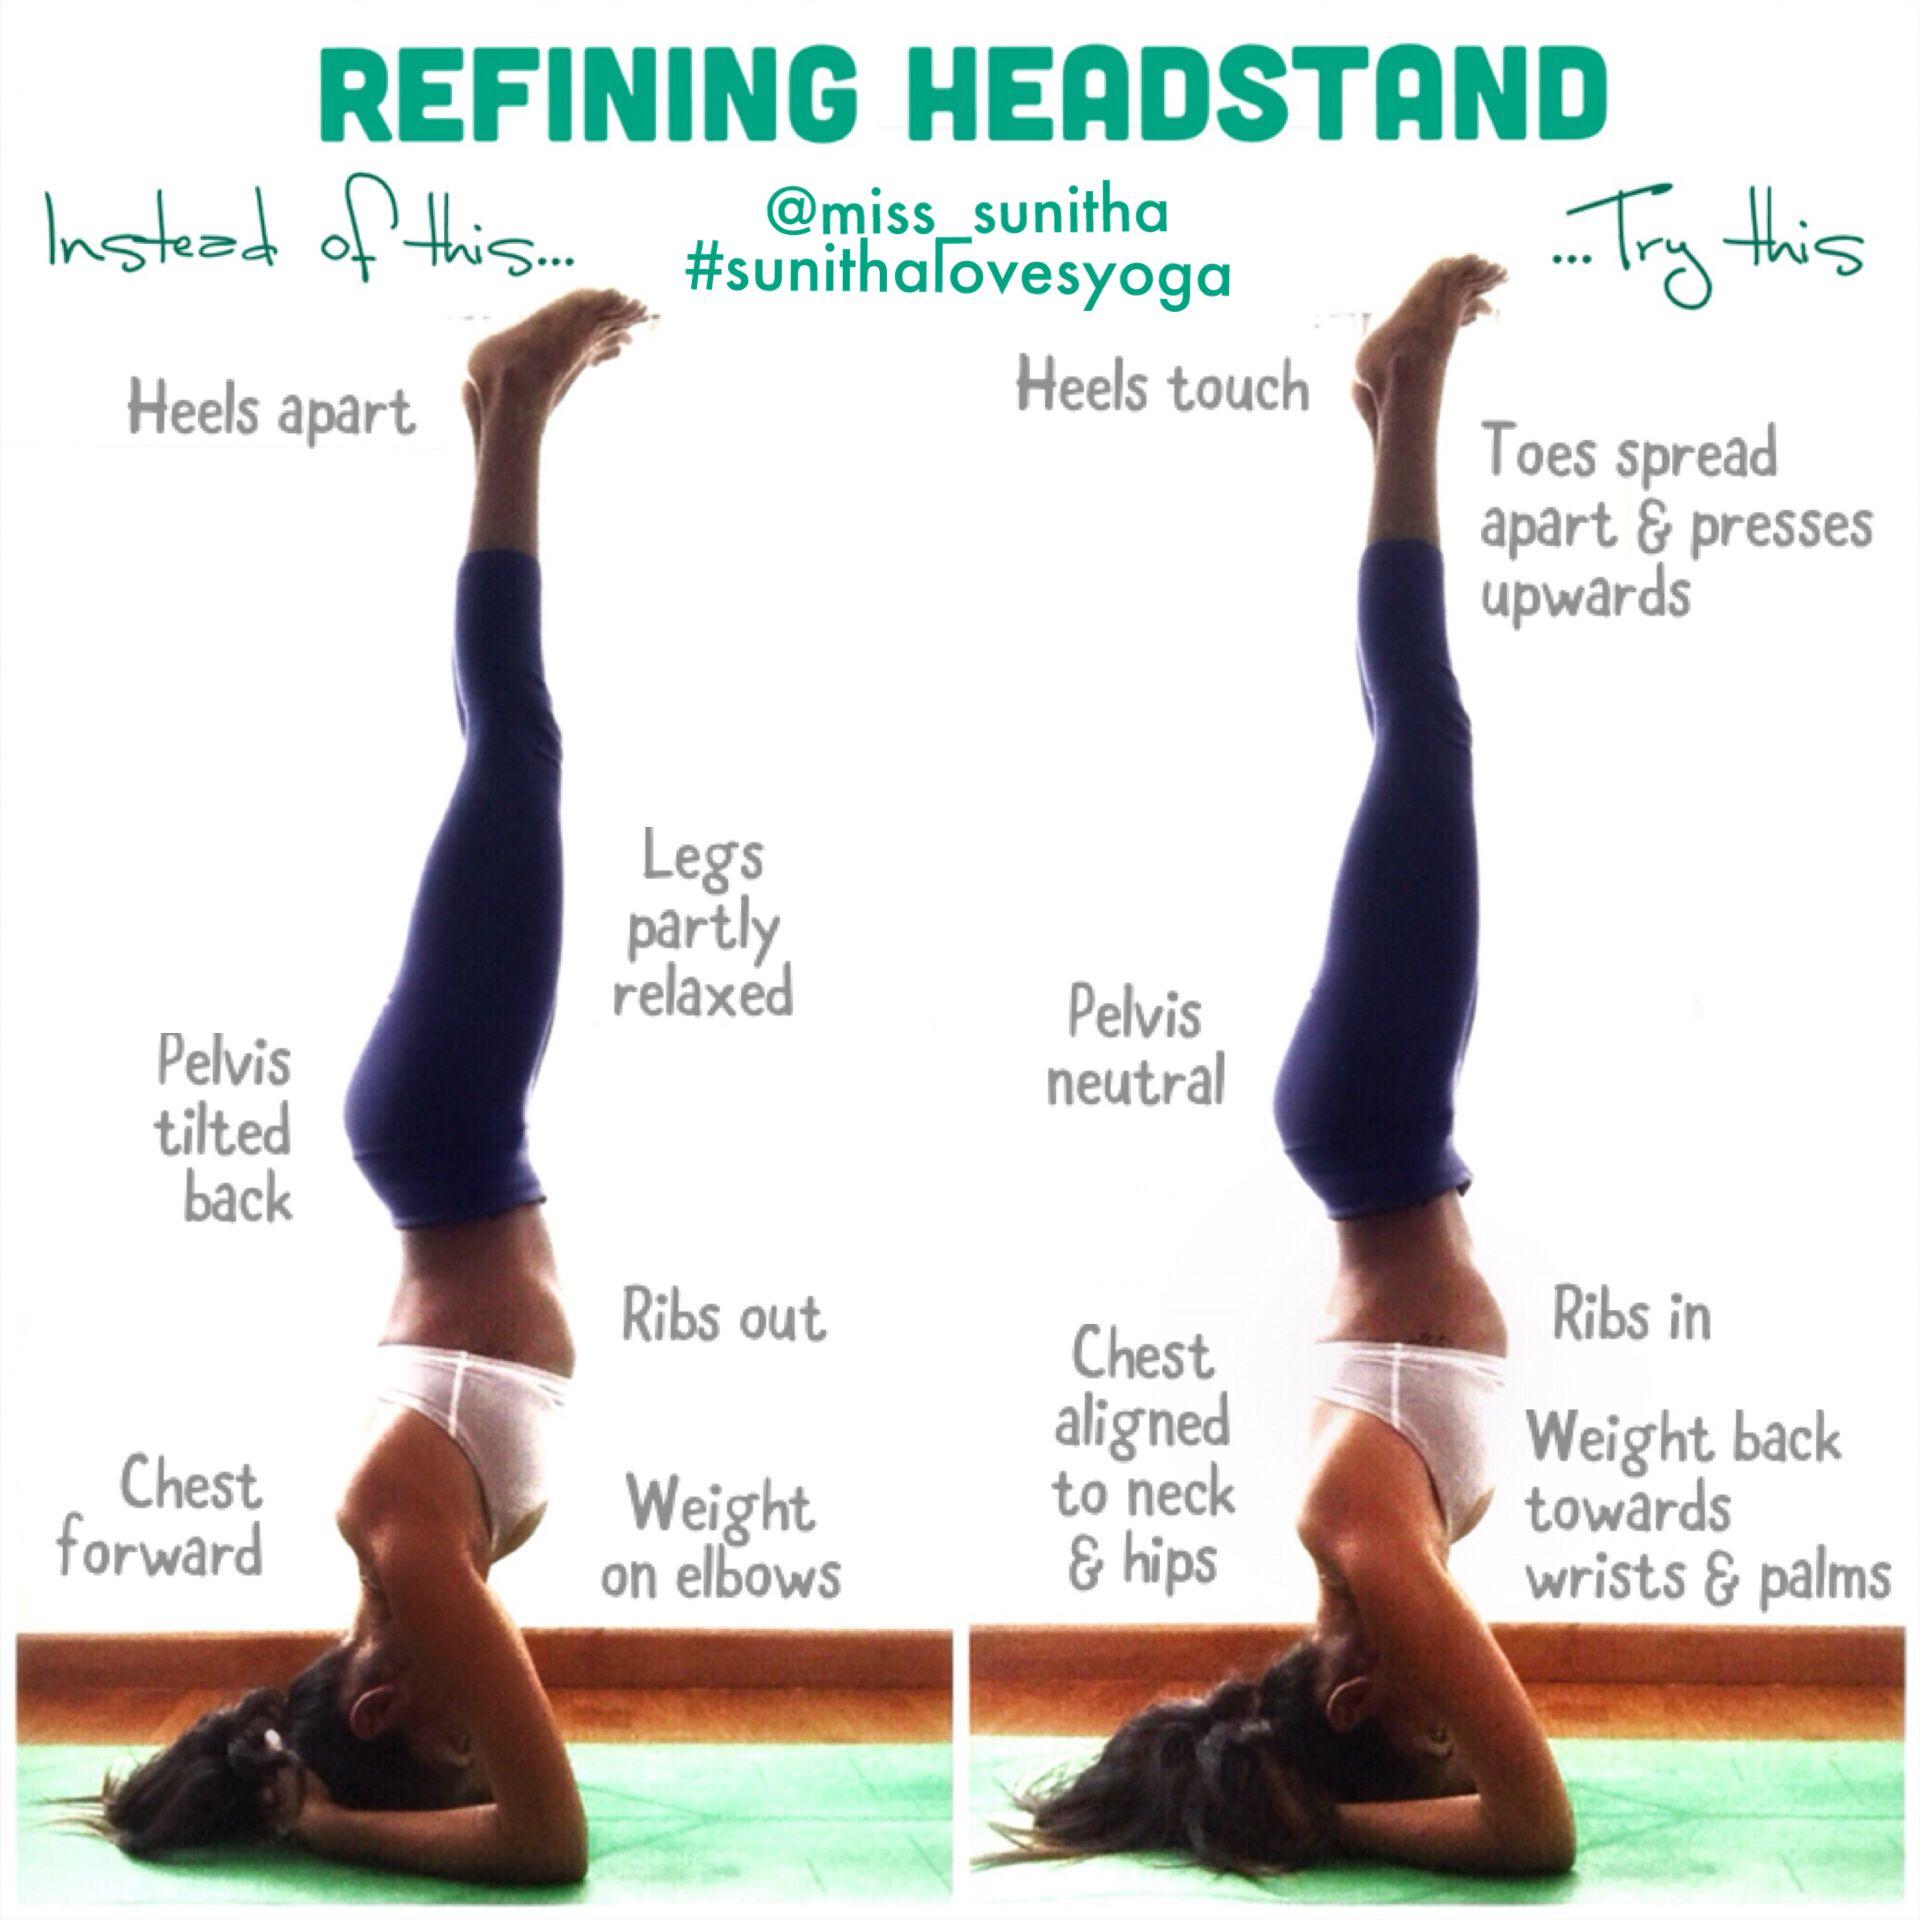 Yoga Tutorial On Refining Headstand Sirsasana Miss Sunitha Sunithalovesyoga Yoga Tutorial Easy Yoga Workouts Yoga Images